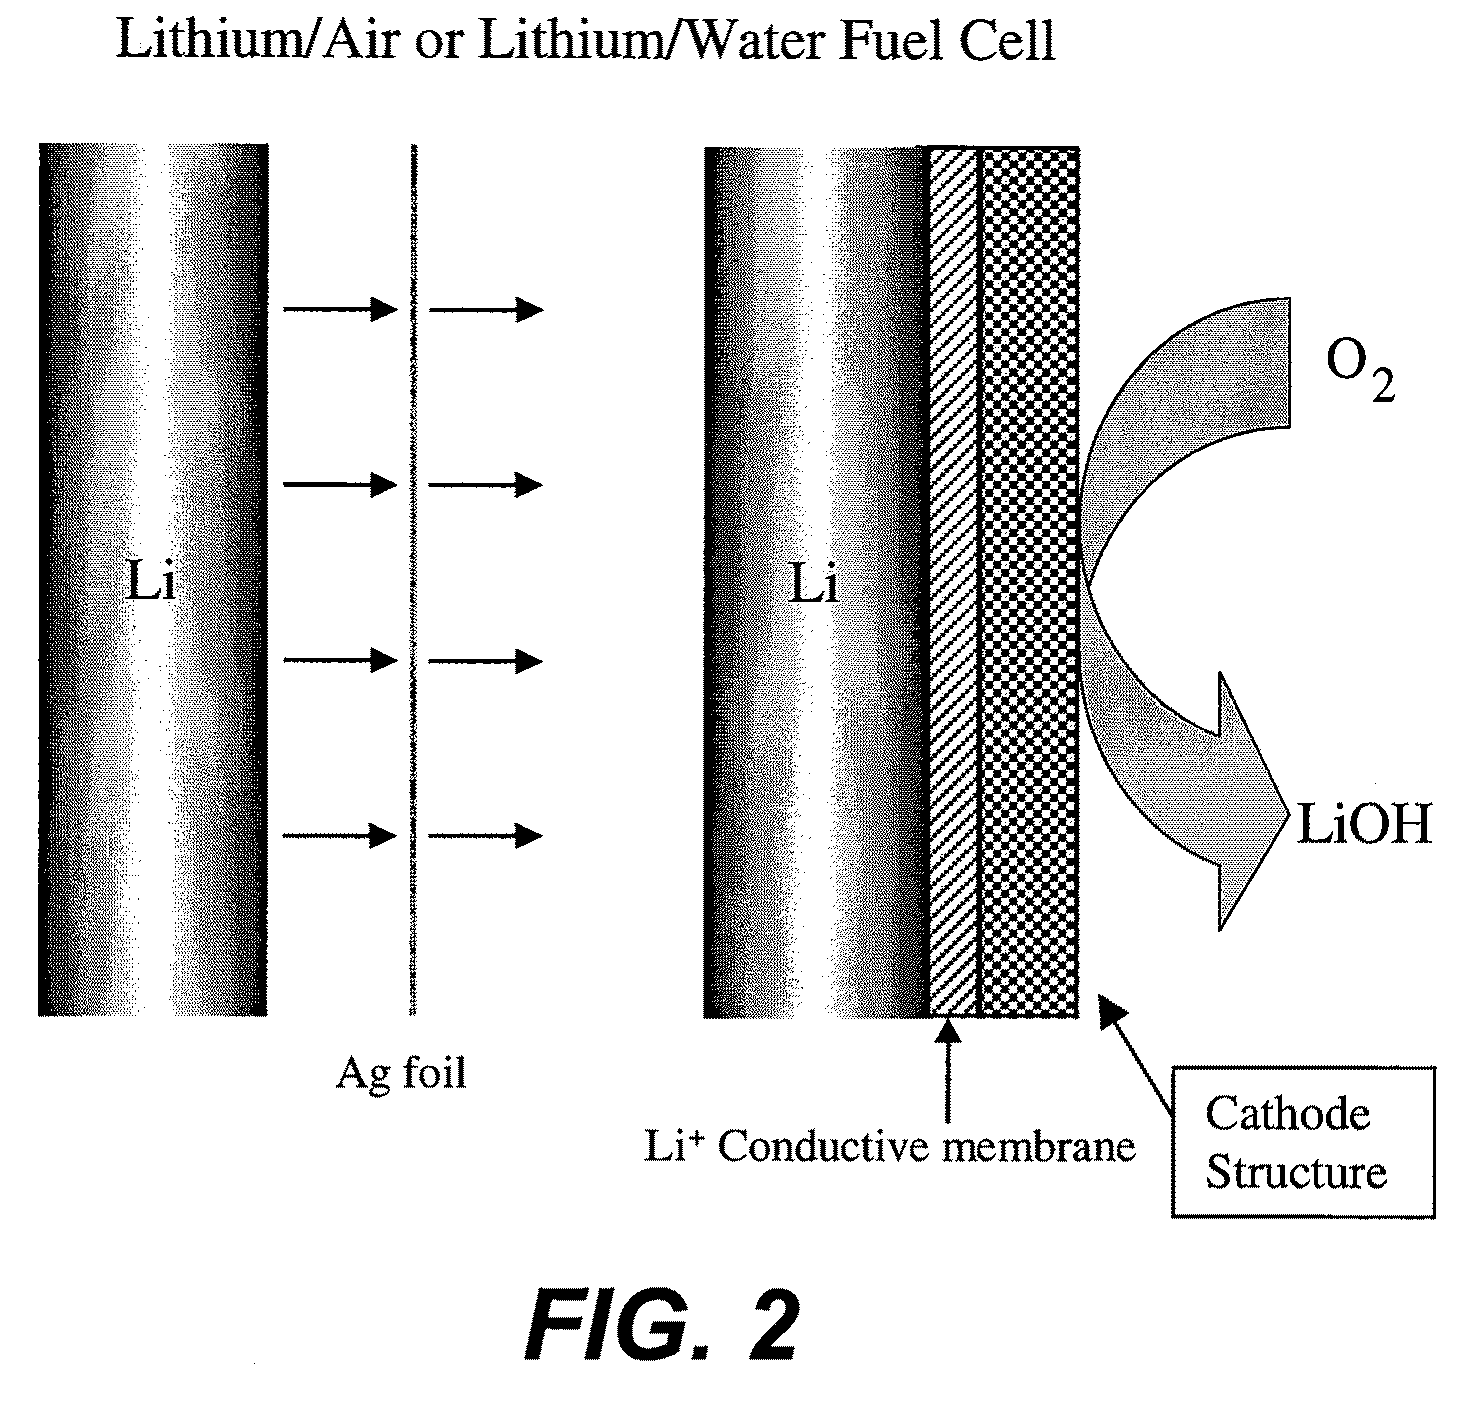 lithium ion cell diagram strike slip fault block patent us7781108 active metal fuel cells google patents